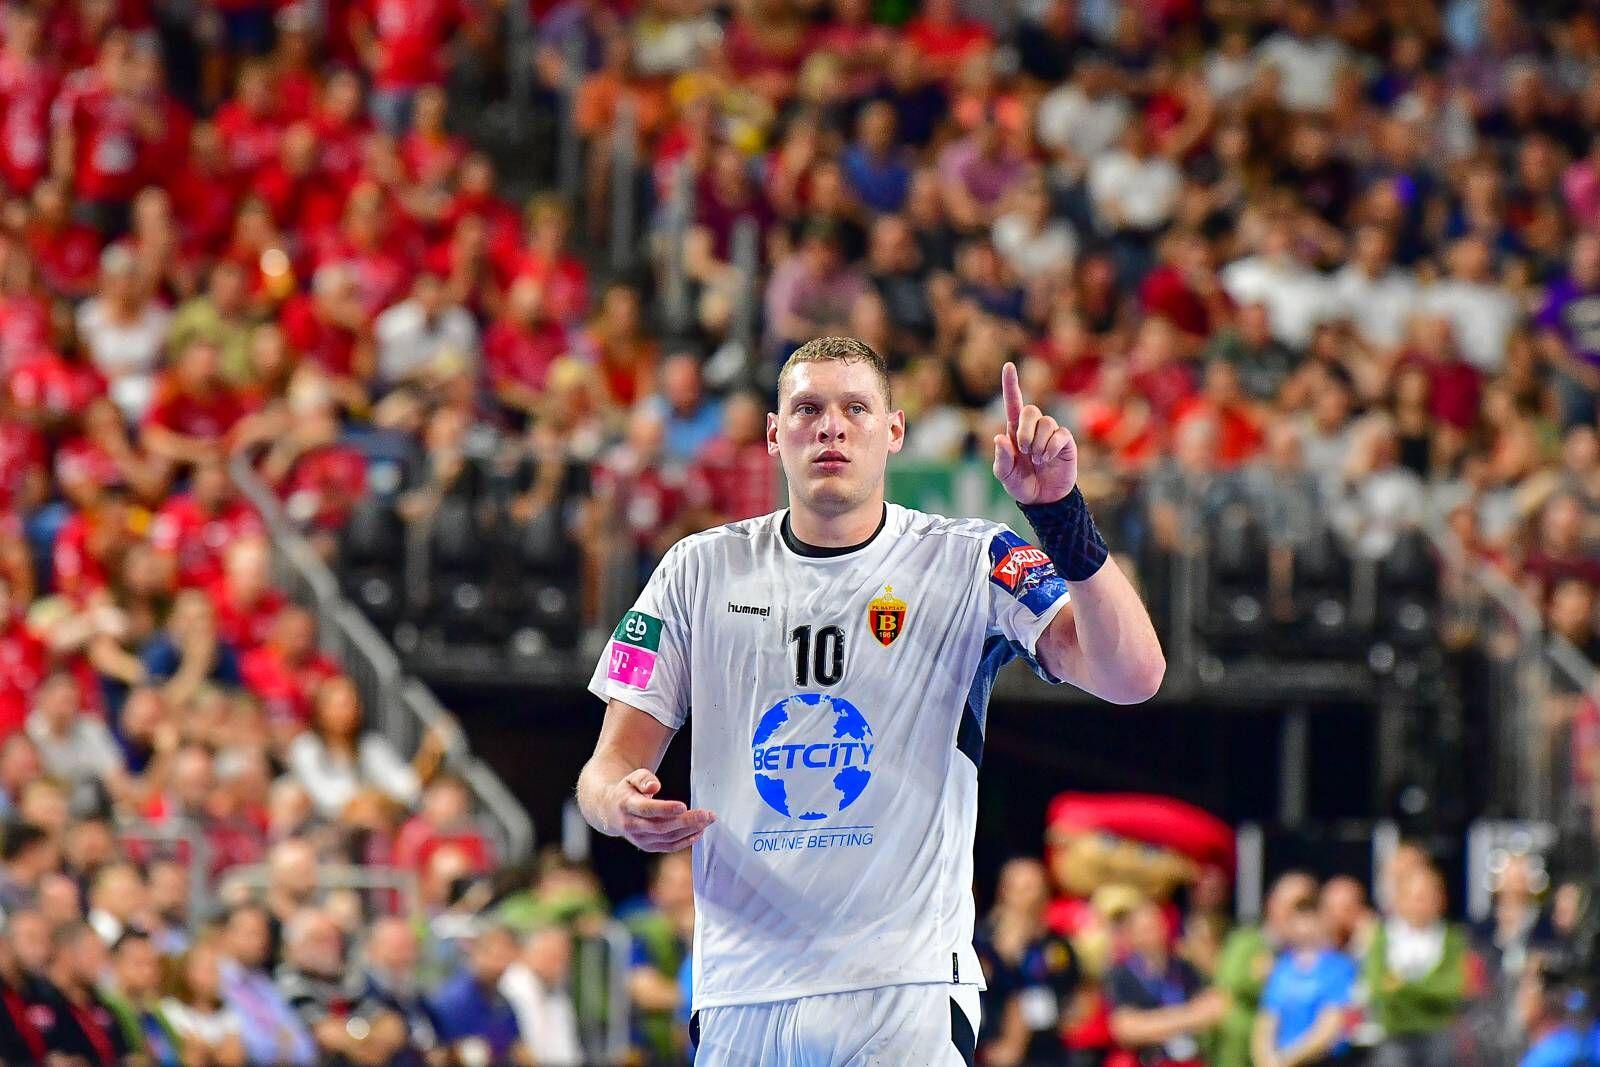 VELUX EHF FINAL4 2019 VELUX EHF FINAL4 2019 Finale HC Vardar Telekom Veszprem HC 02 06 2019 LANXES